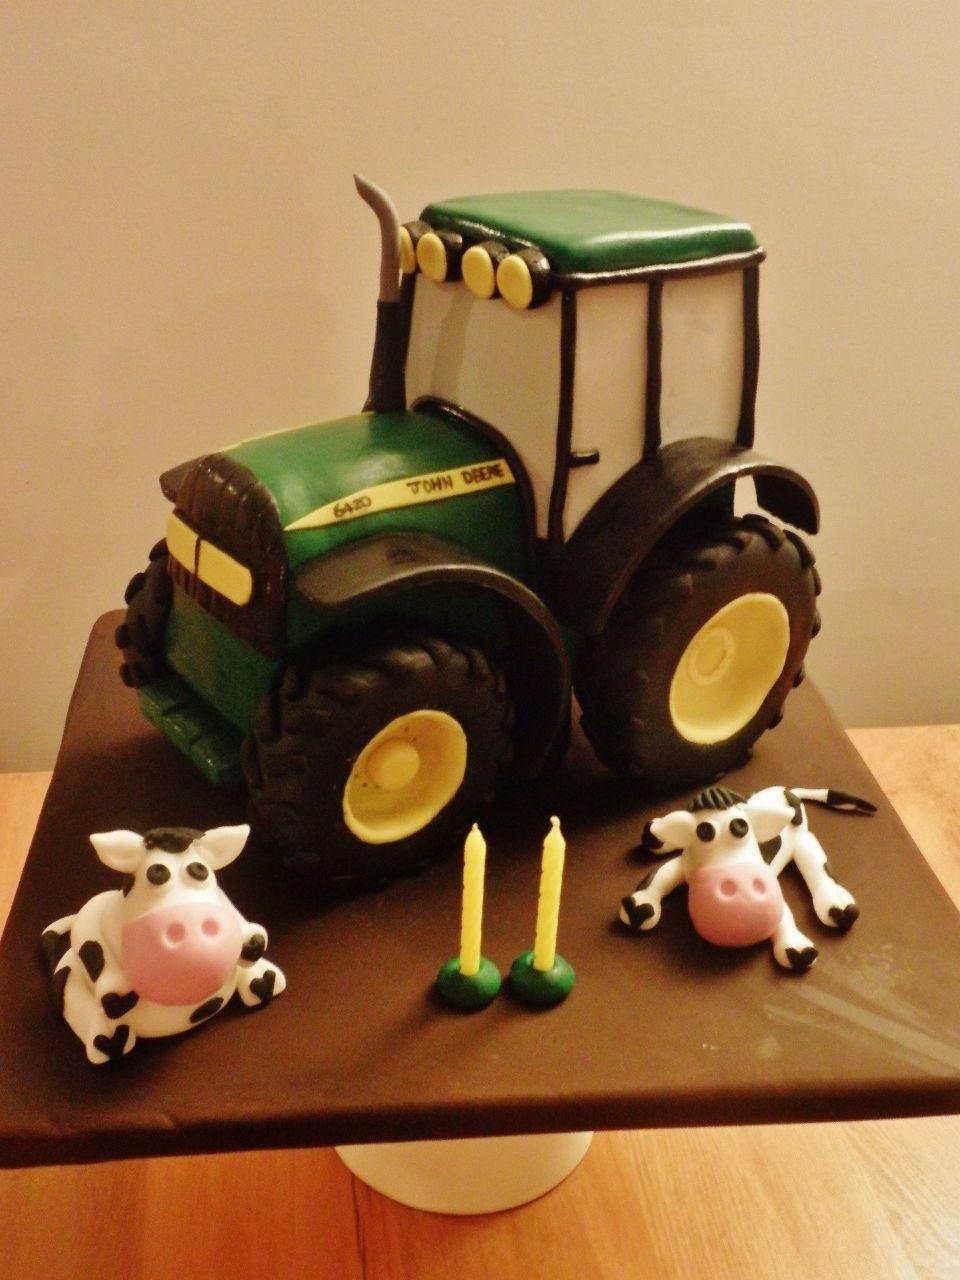 John Deere Tractor Cake Ideas Recipe The Best Cake Of 2018